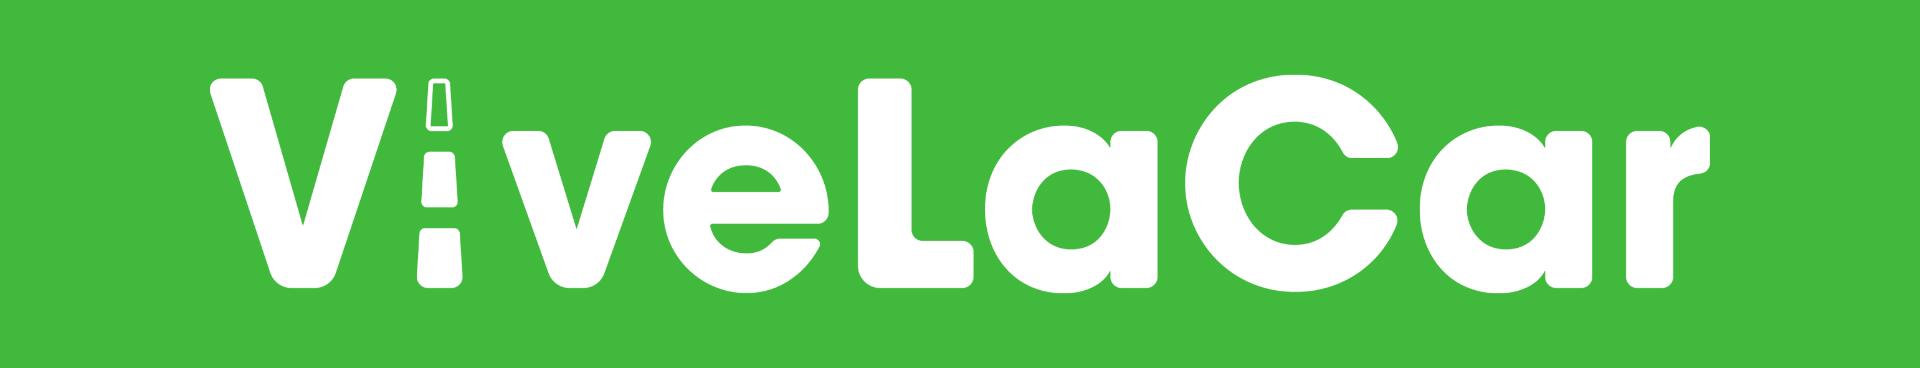 Vivelacar Logo Green Background